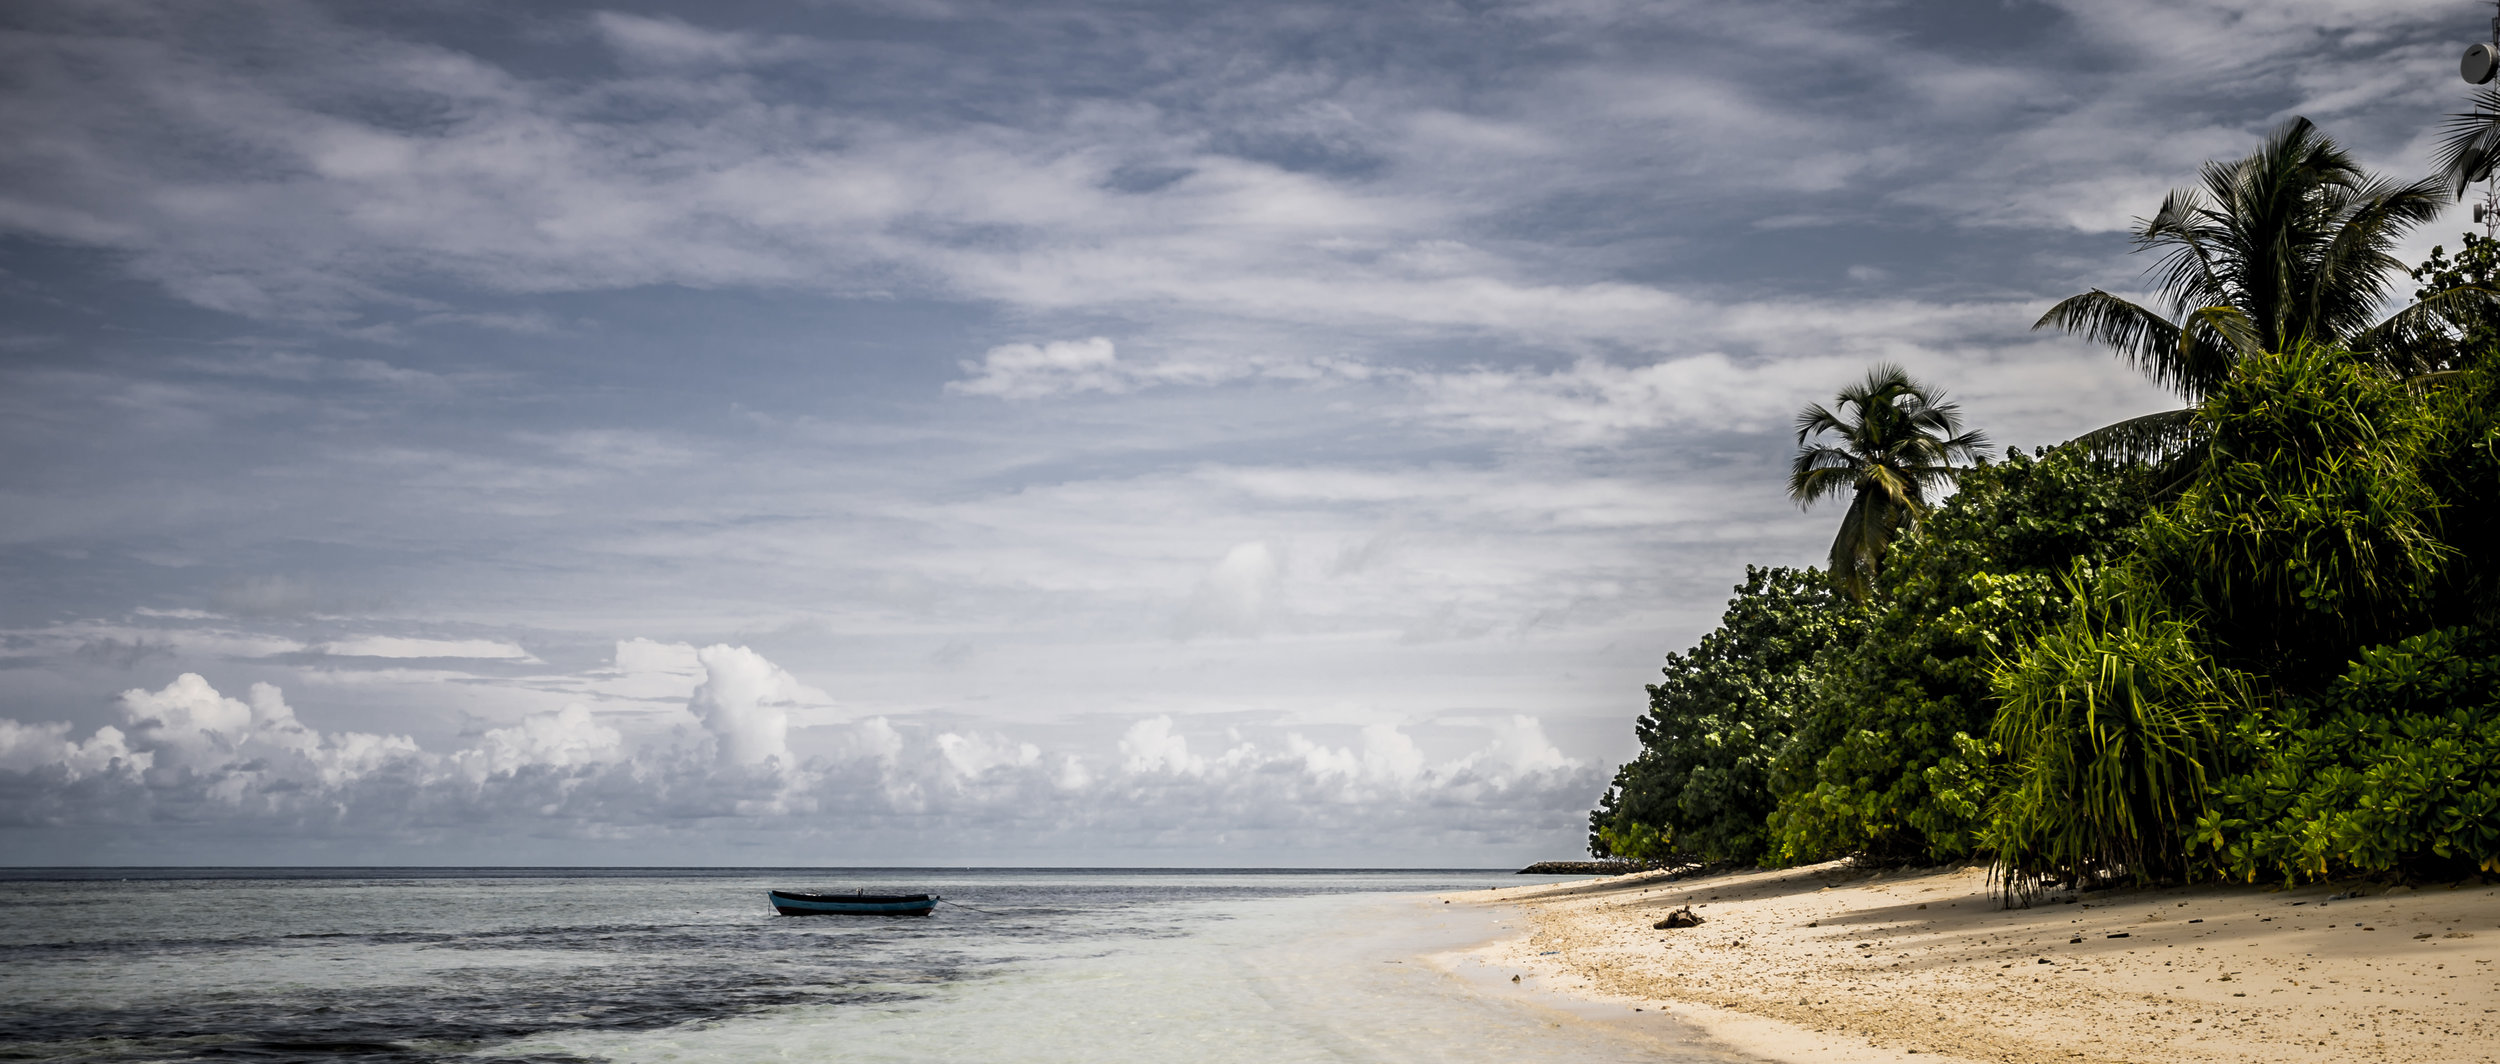 Maldives (2).jpg